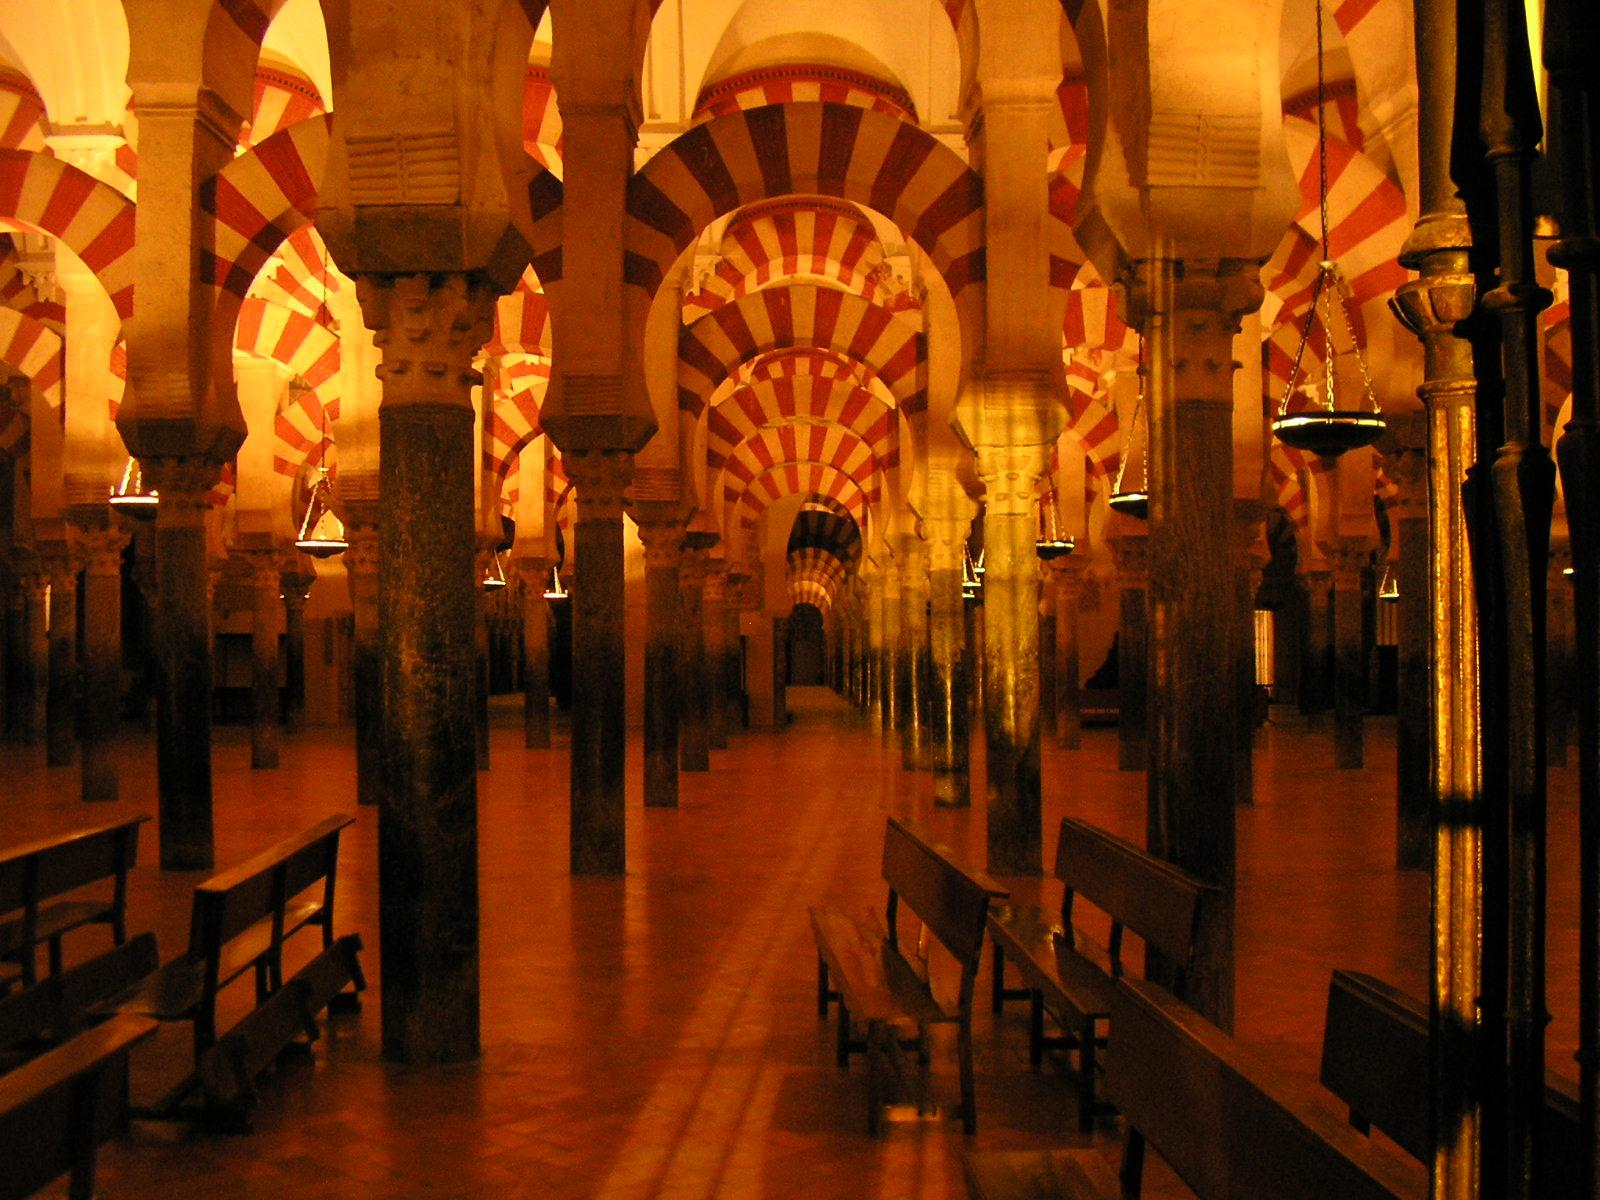 Escapada al sur mundo lin leo - Mezquita de cordoba de noche ...